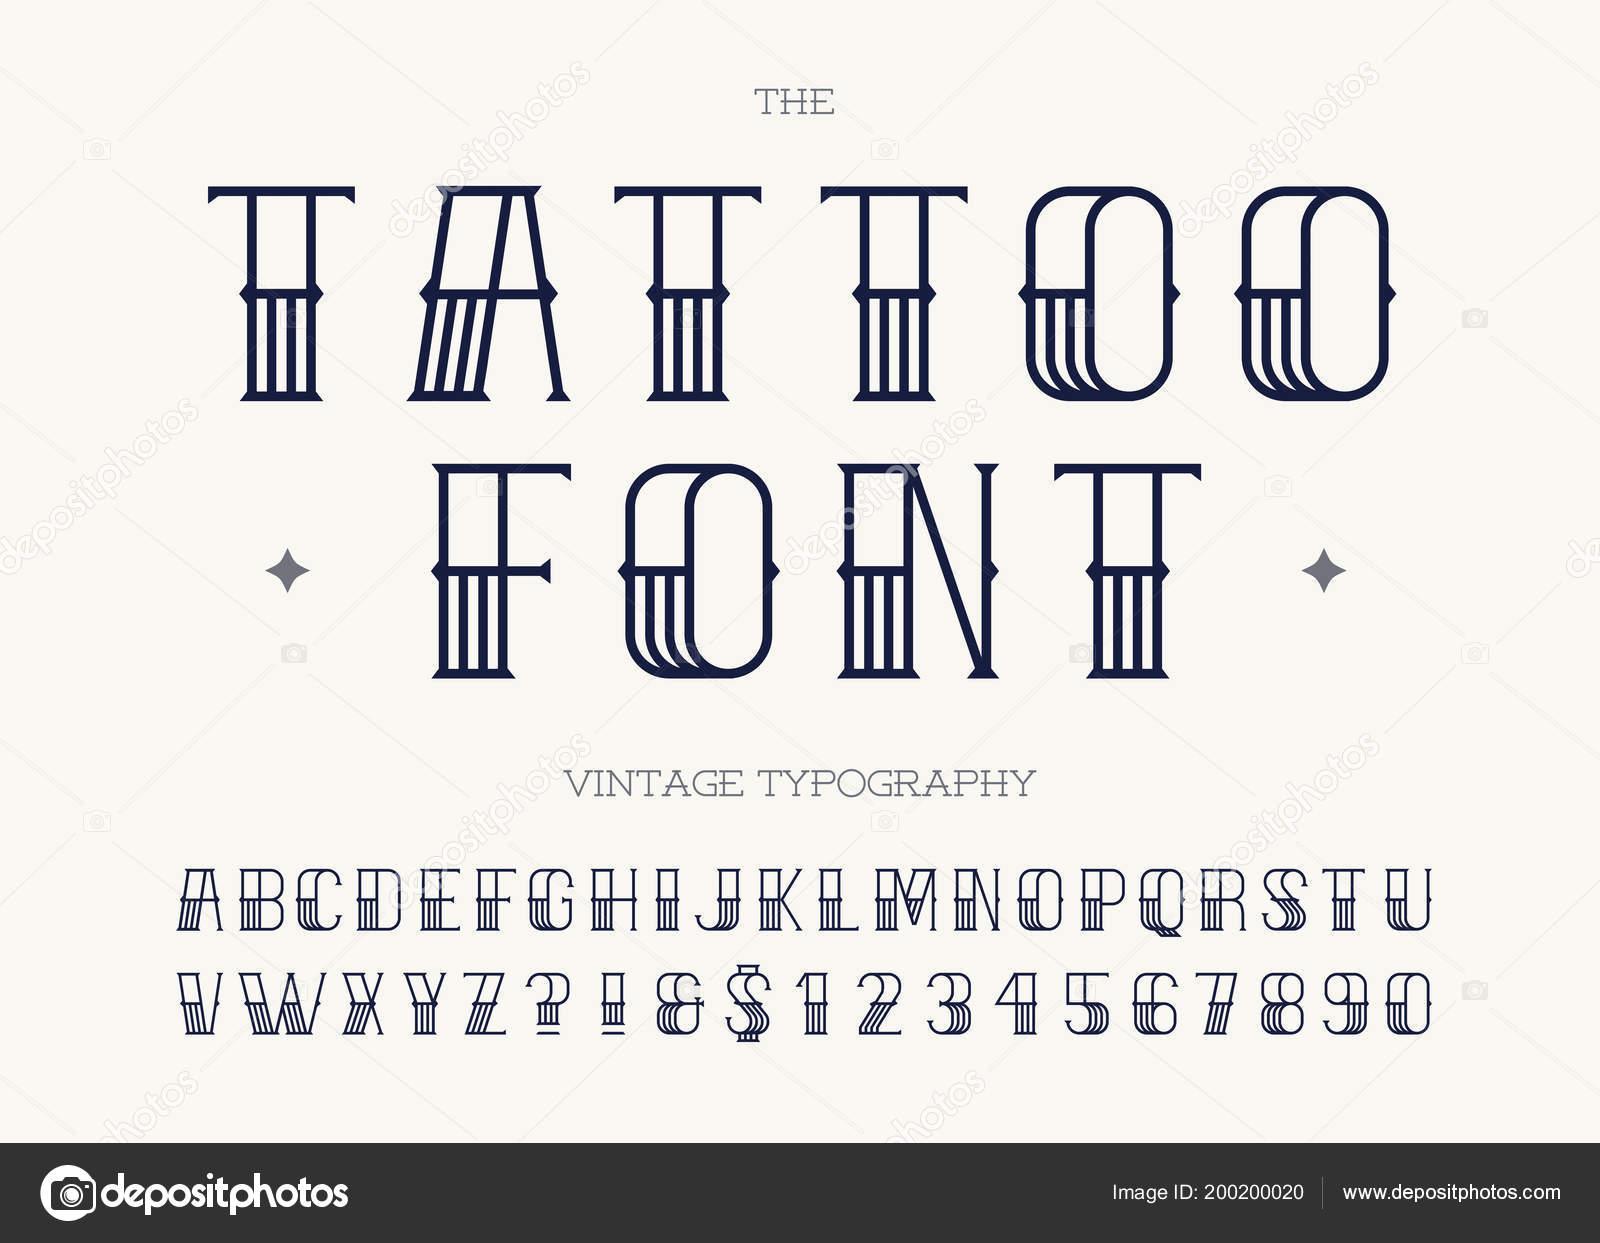 Tatuaż Czarny Kolor Retro Czcionki Sans Serif Stylu Dla